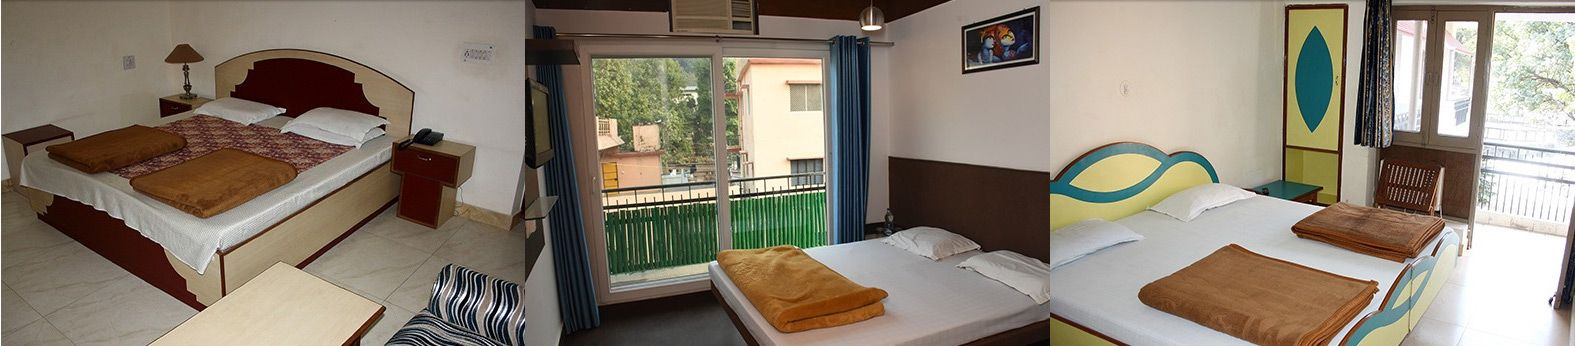 hotel moksha rooms